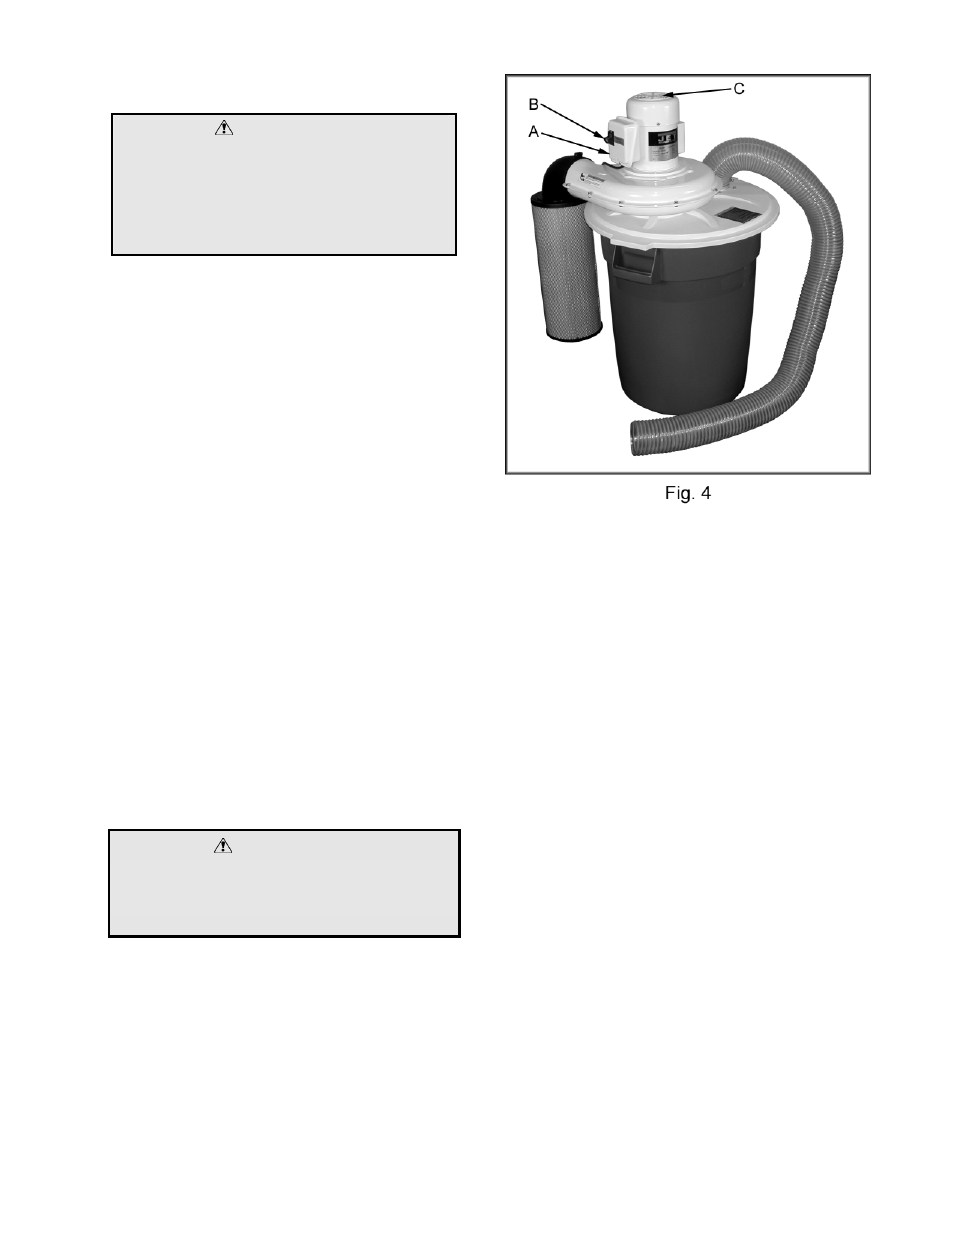 Warning | Jet Tools DC-650TS User Manual | Page 9 / 13